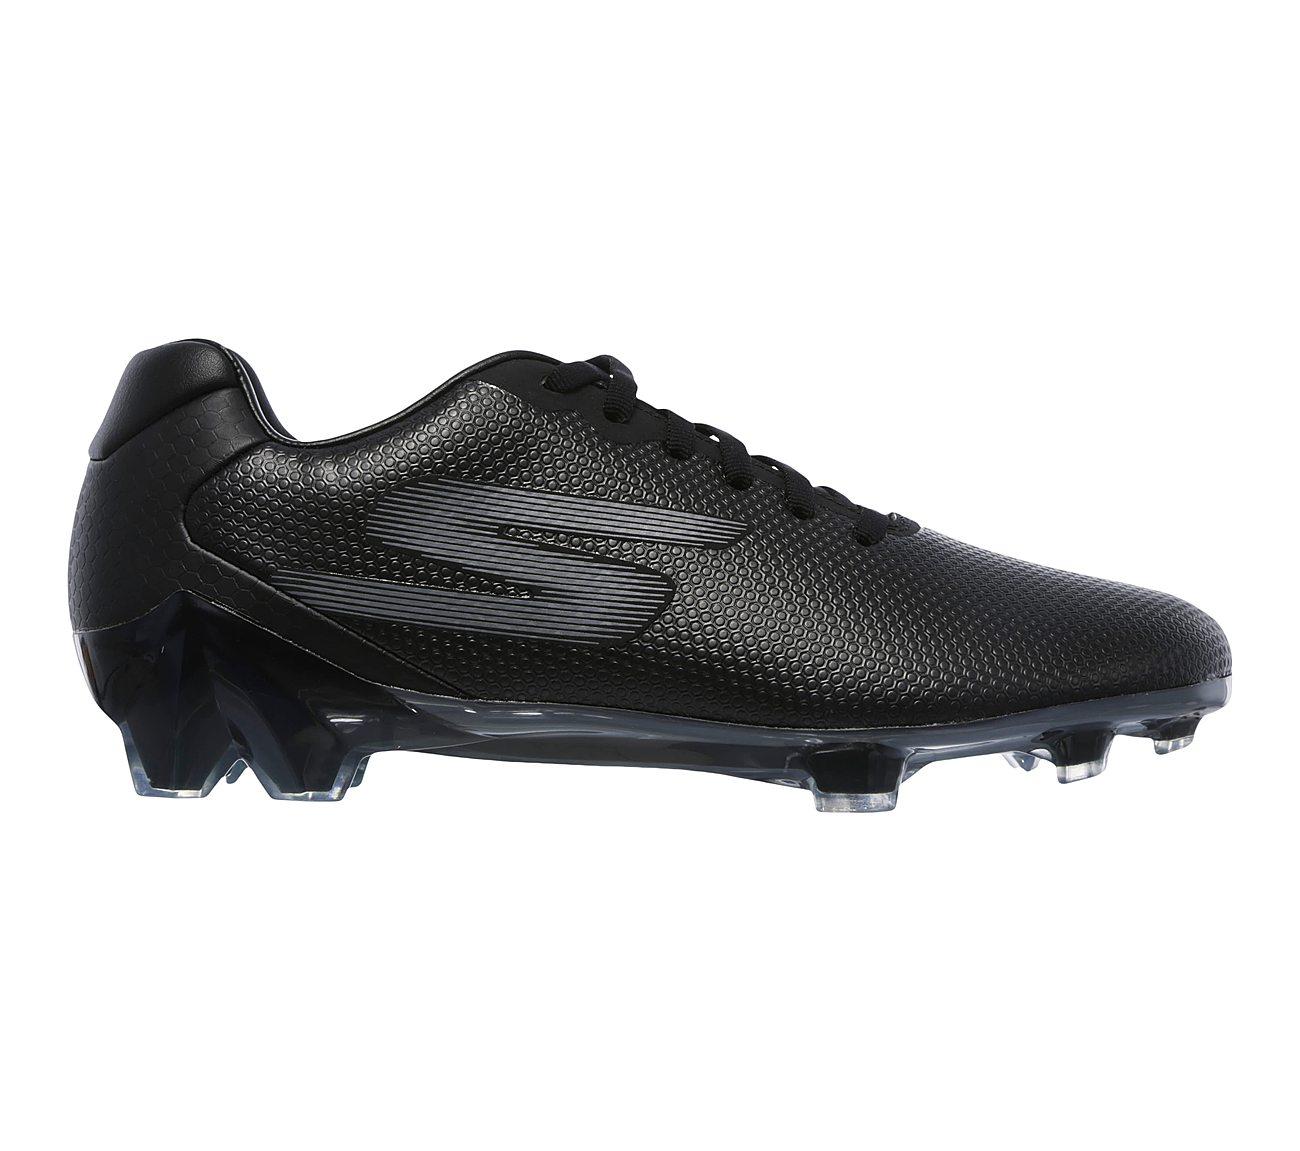 half off 8b780 aec2c skechers galaxy soccer. skechers galaxy soccer 60.99. skechers galaxy shoes